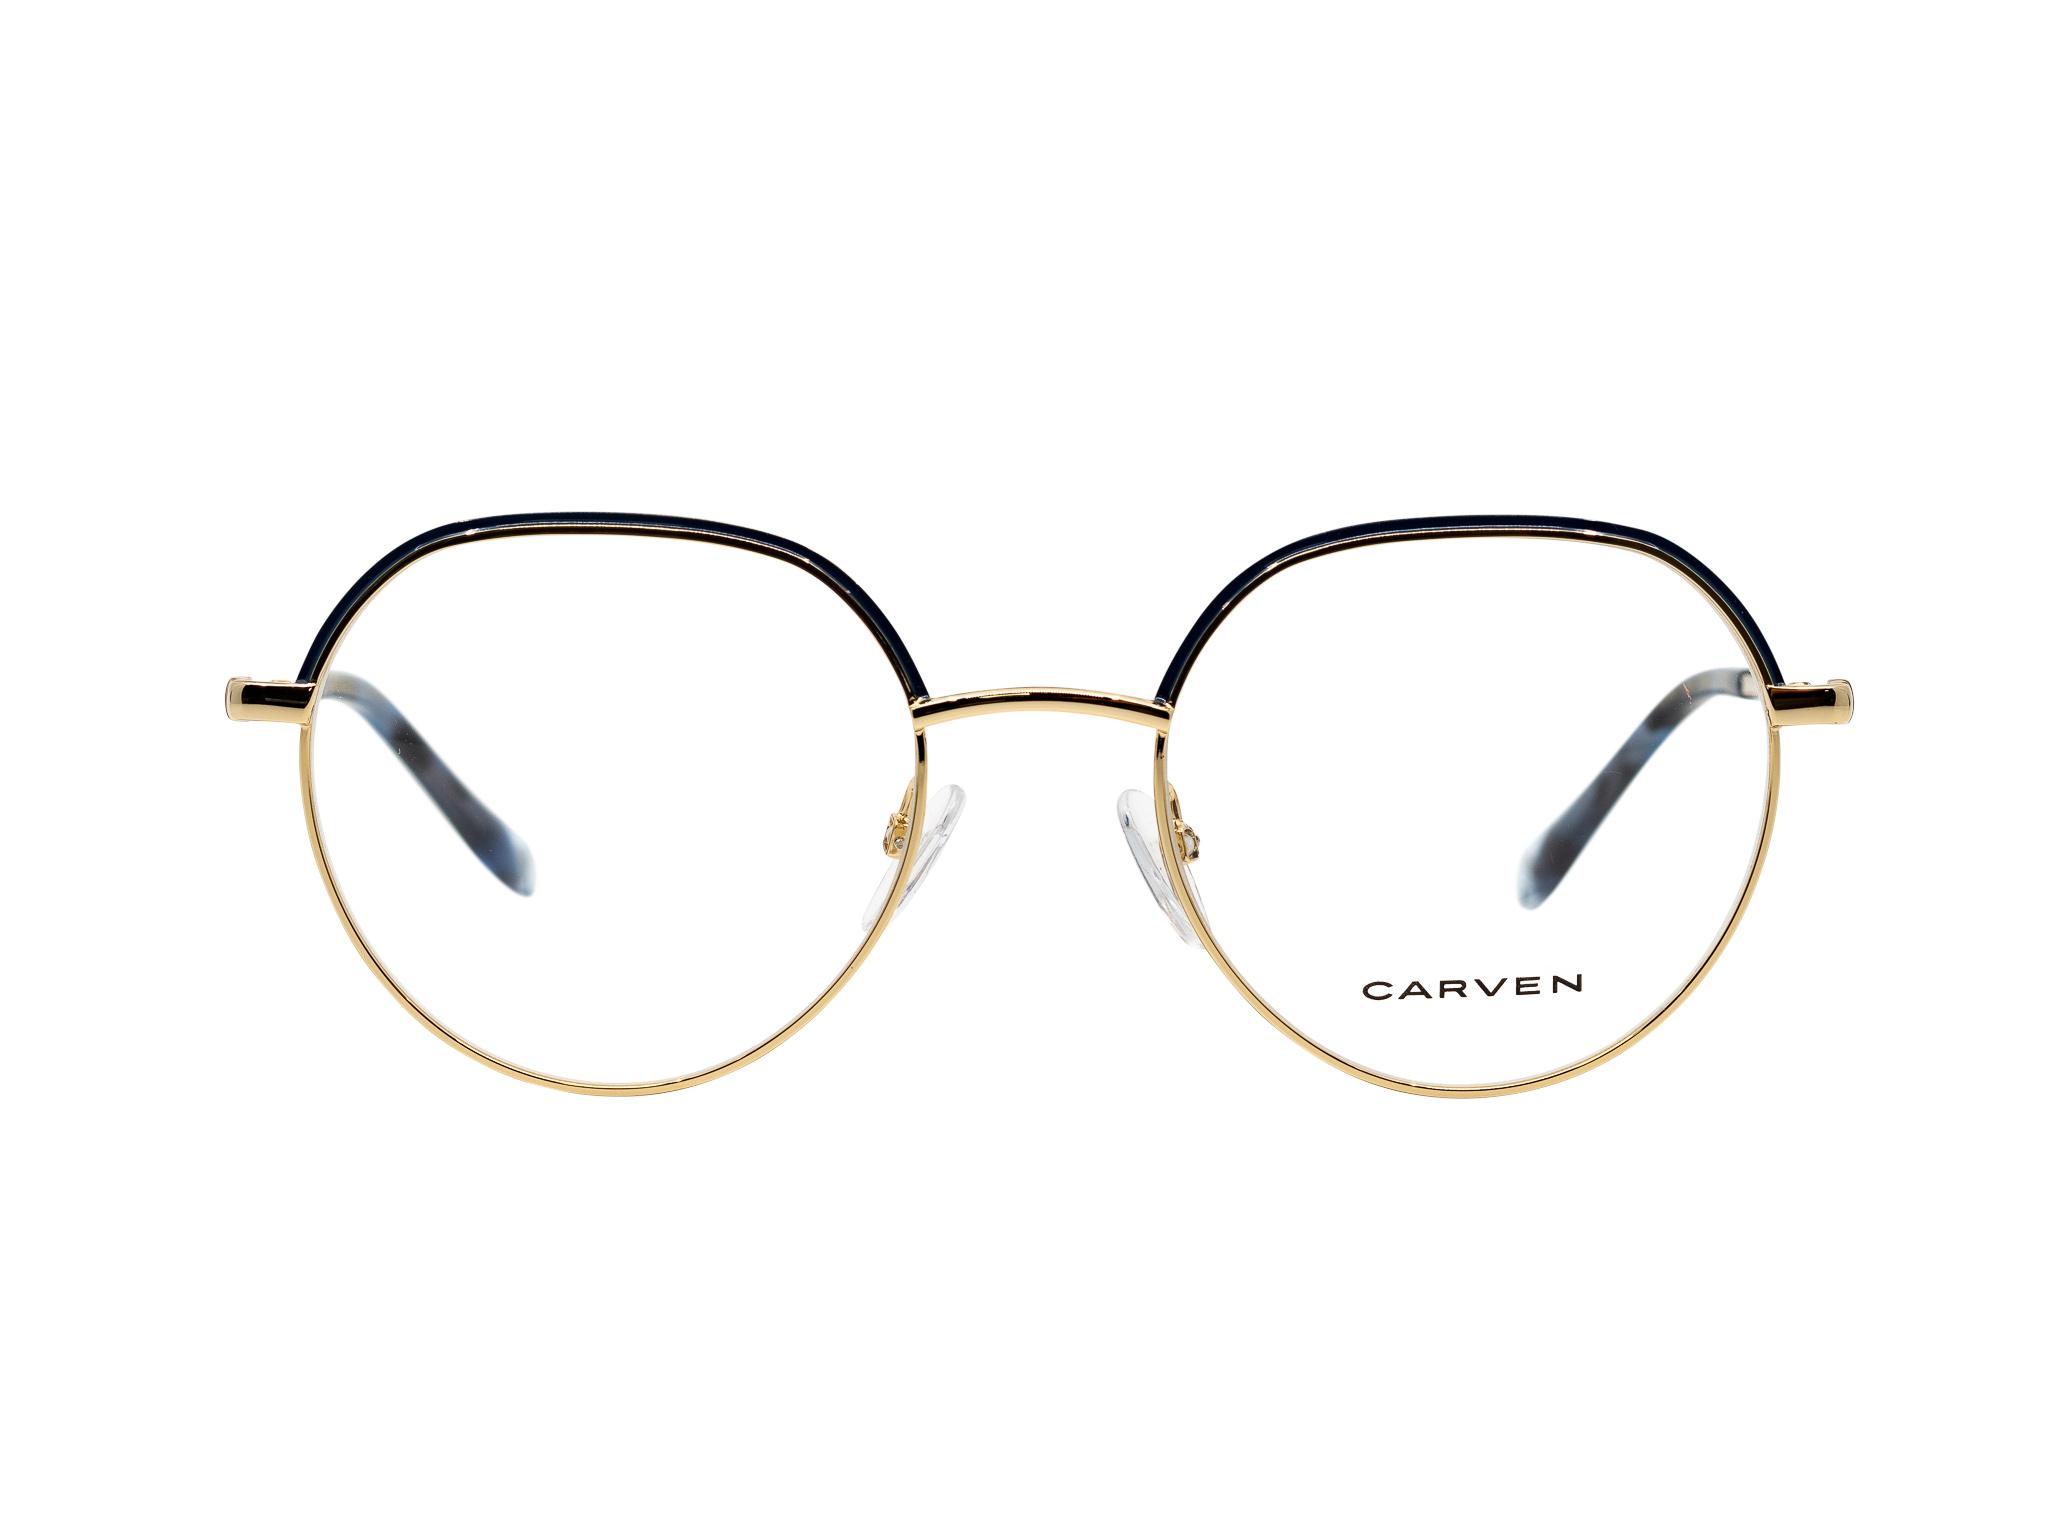 http://Carven%20CC1042%20Dore%20Clair%20Brillant%20Blue